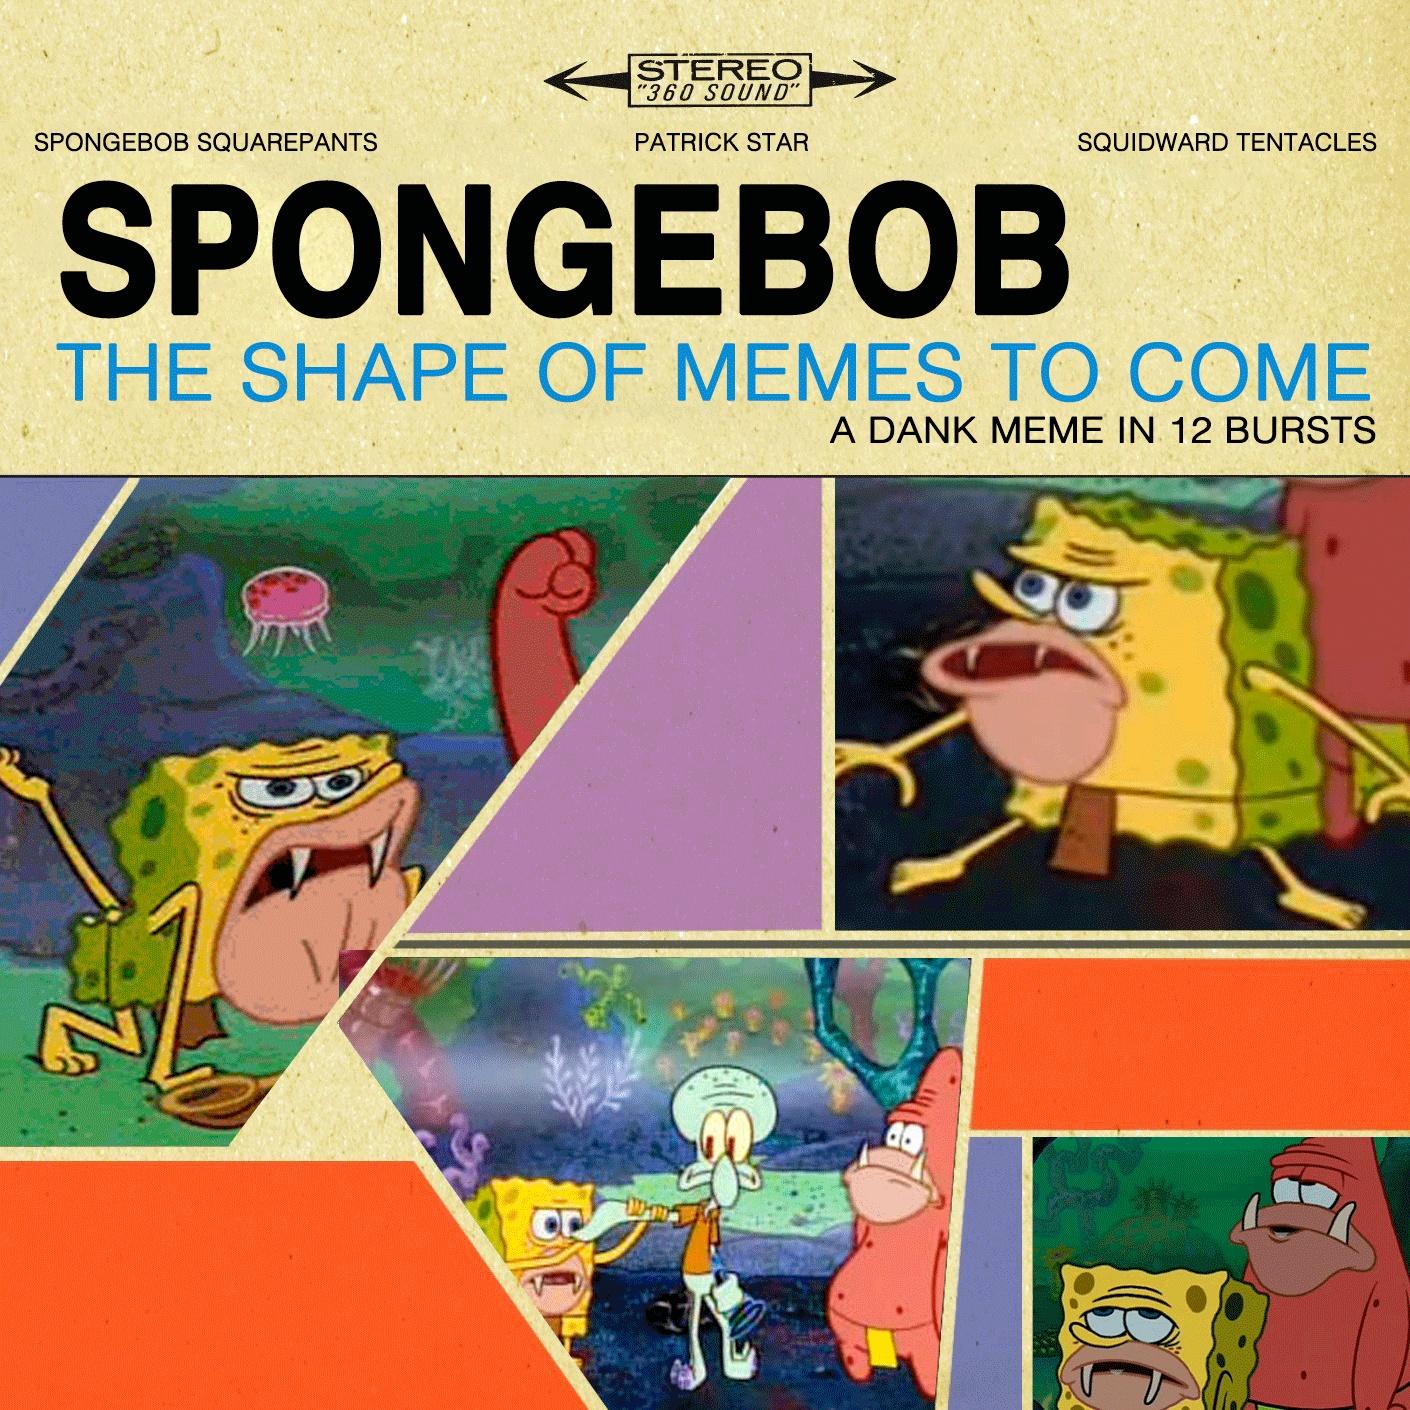 Spongegar primitive sponge caveman spongebob the shape of memes yet to come